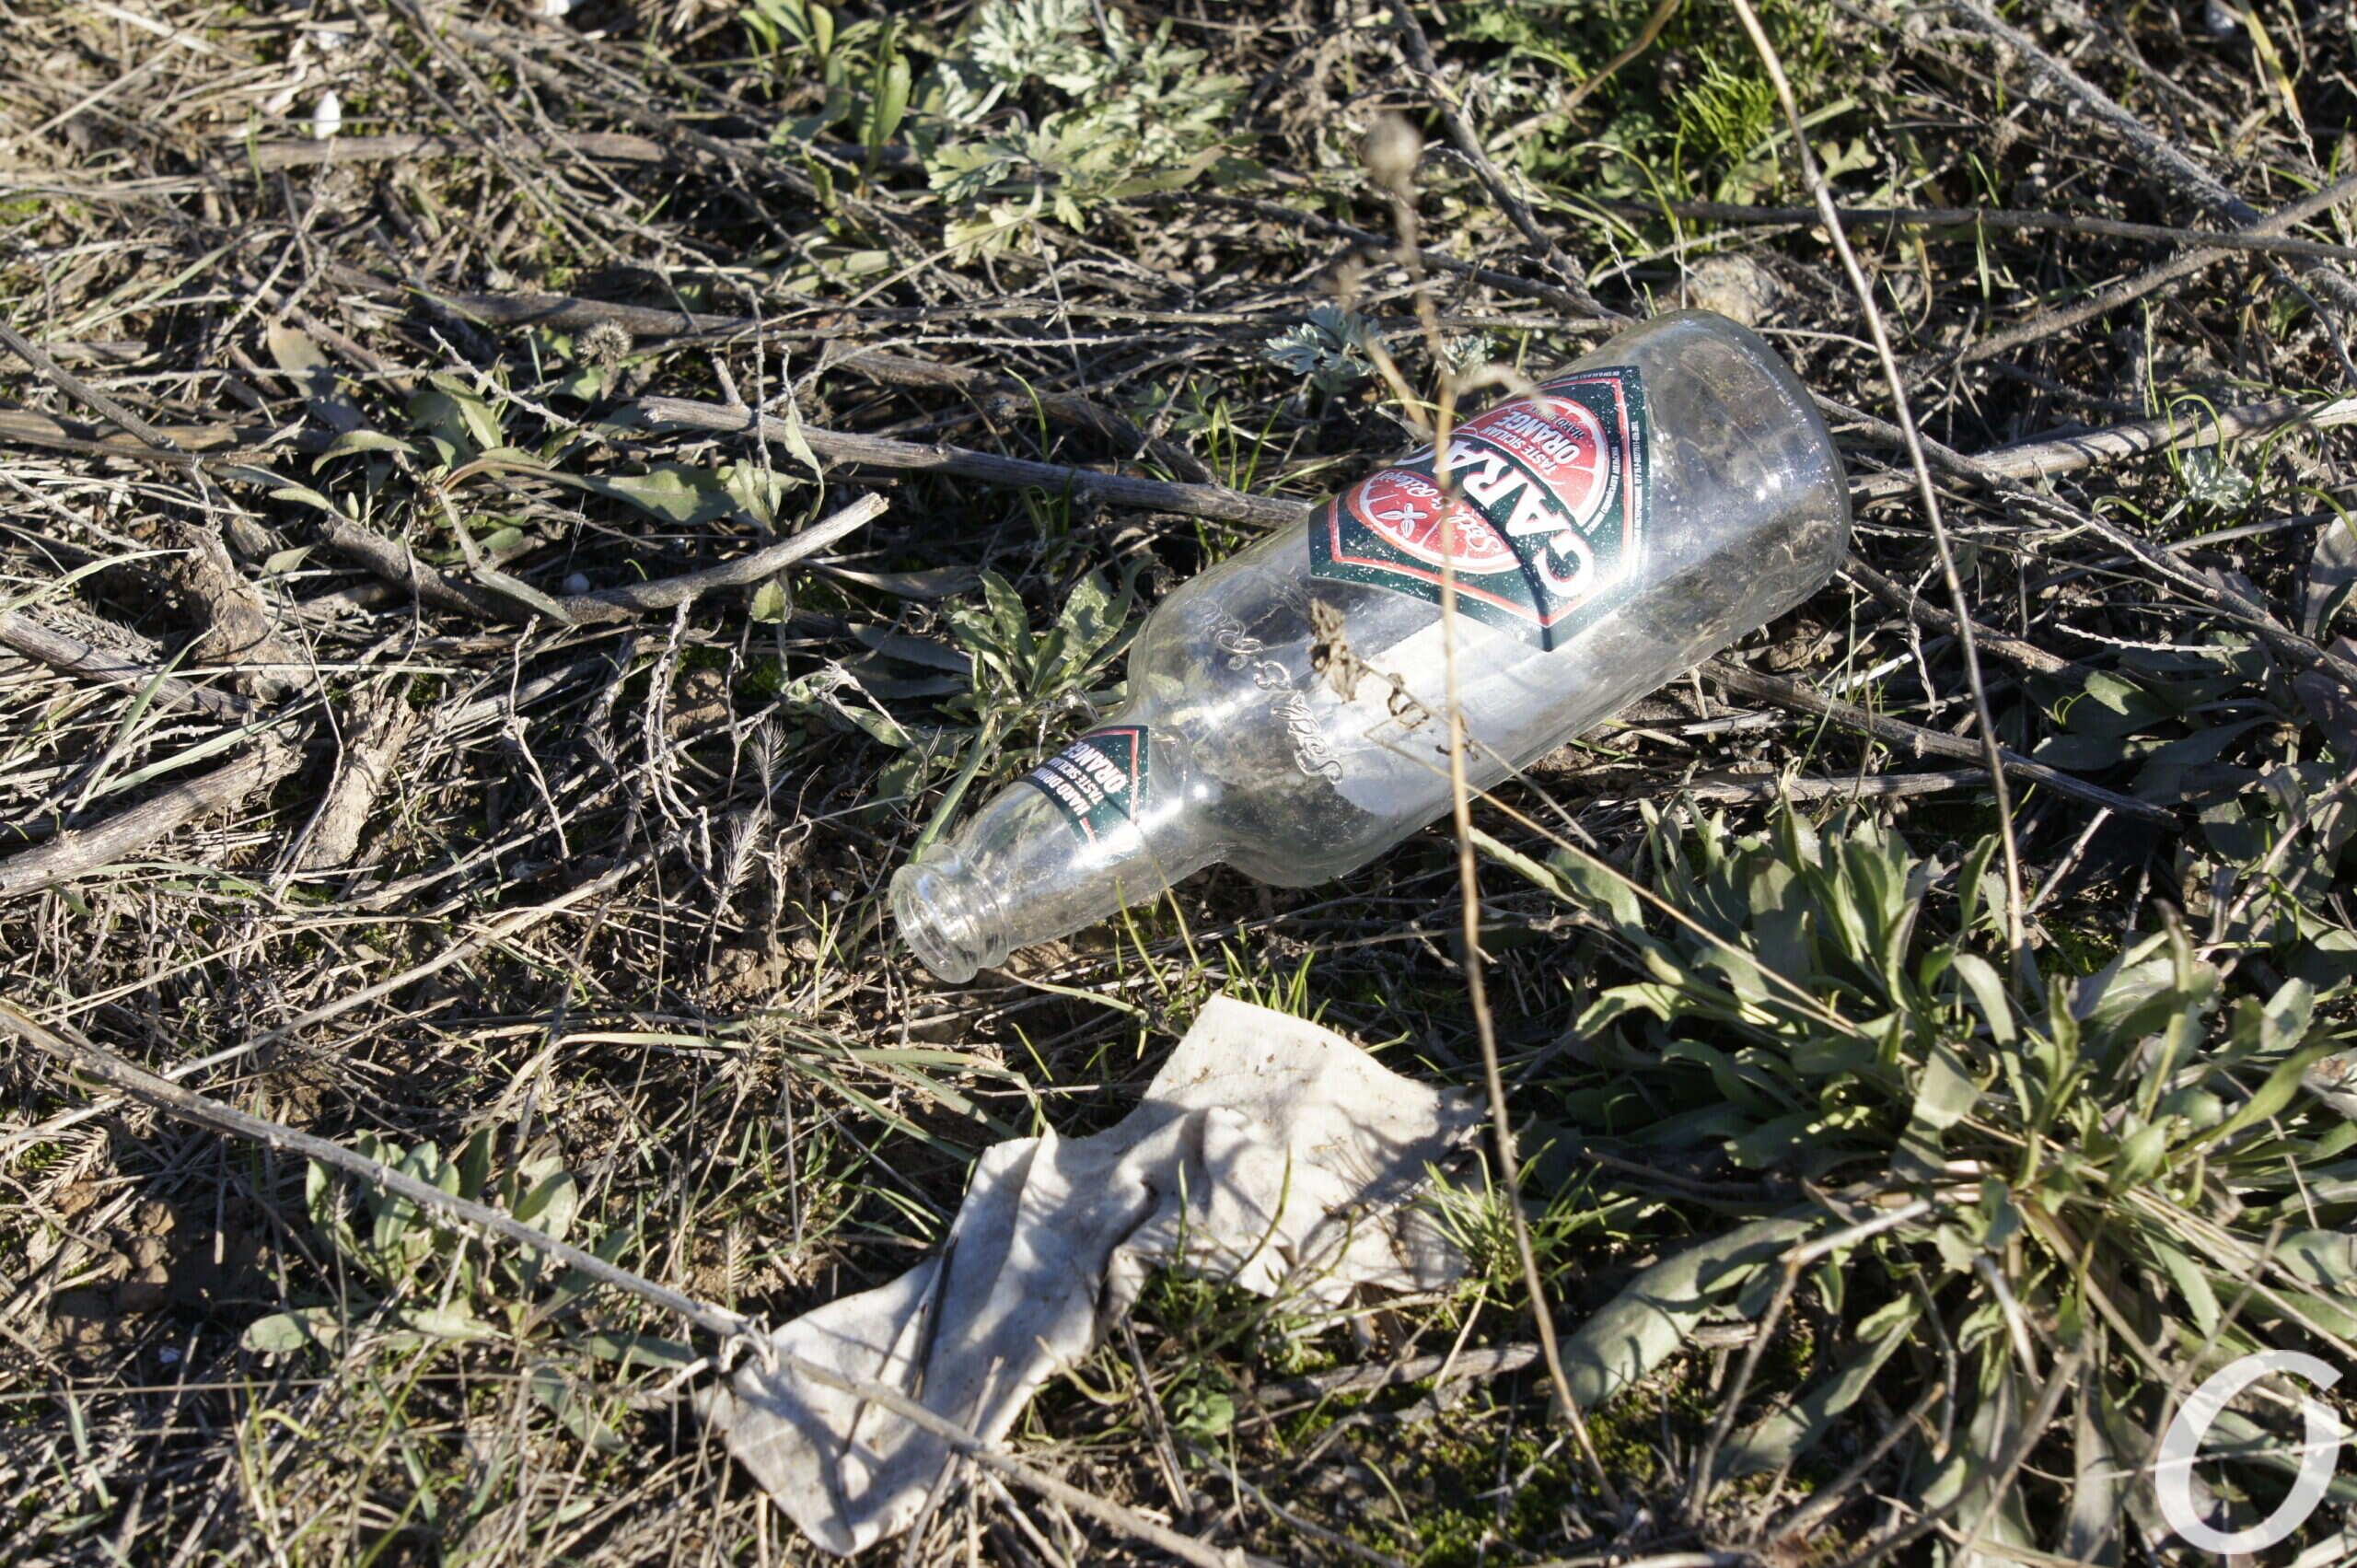 мыс Большой Фонтан, мусор